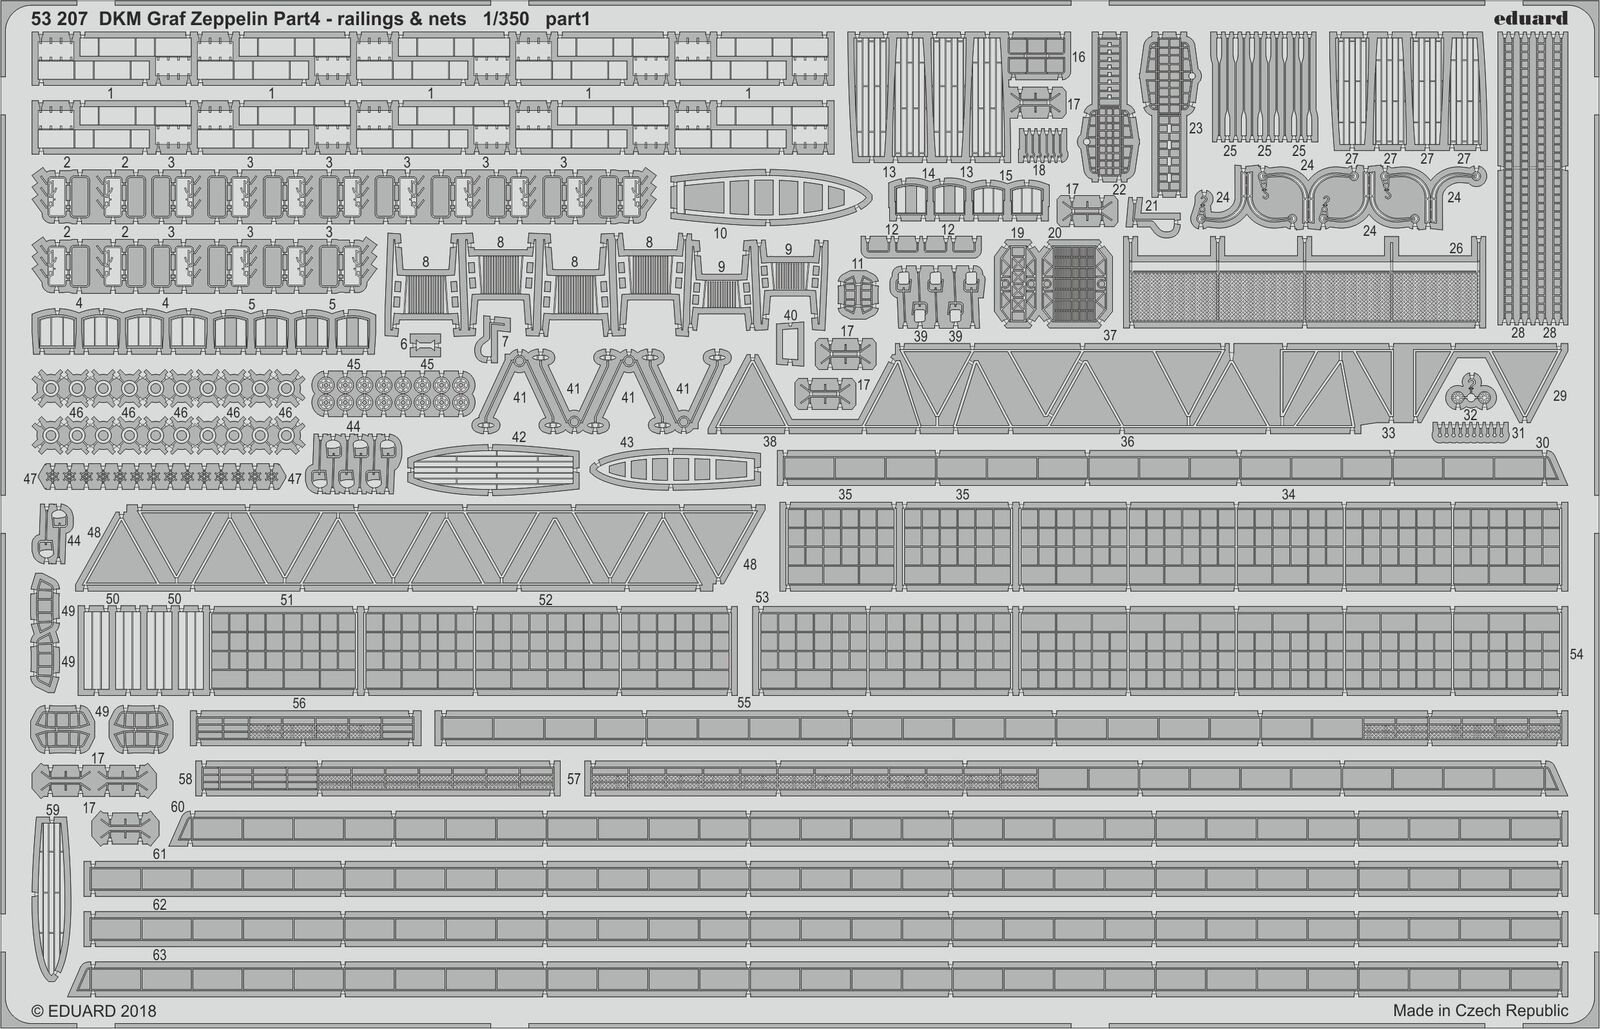 EDUARD 1/350 DKM Graf Zeppelin PARTE 4 - Ringhiere & Nets  53207